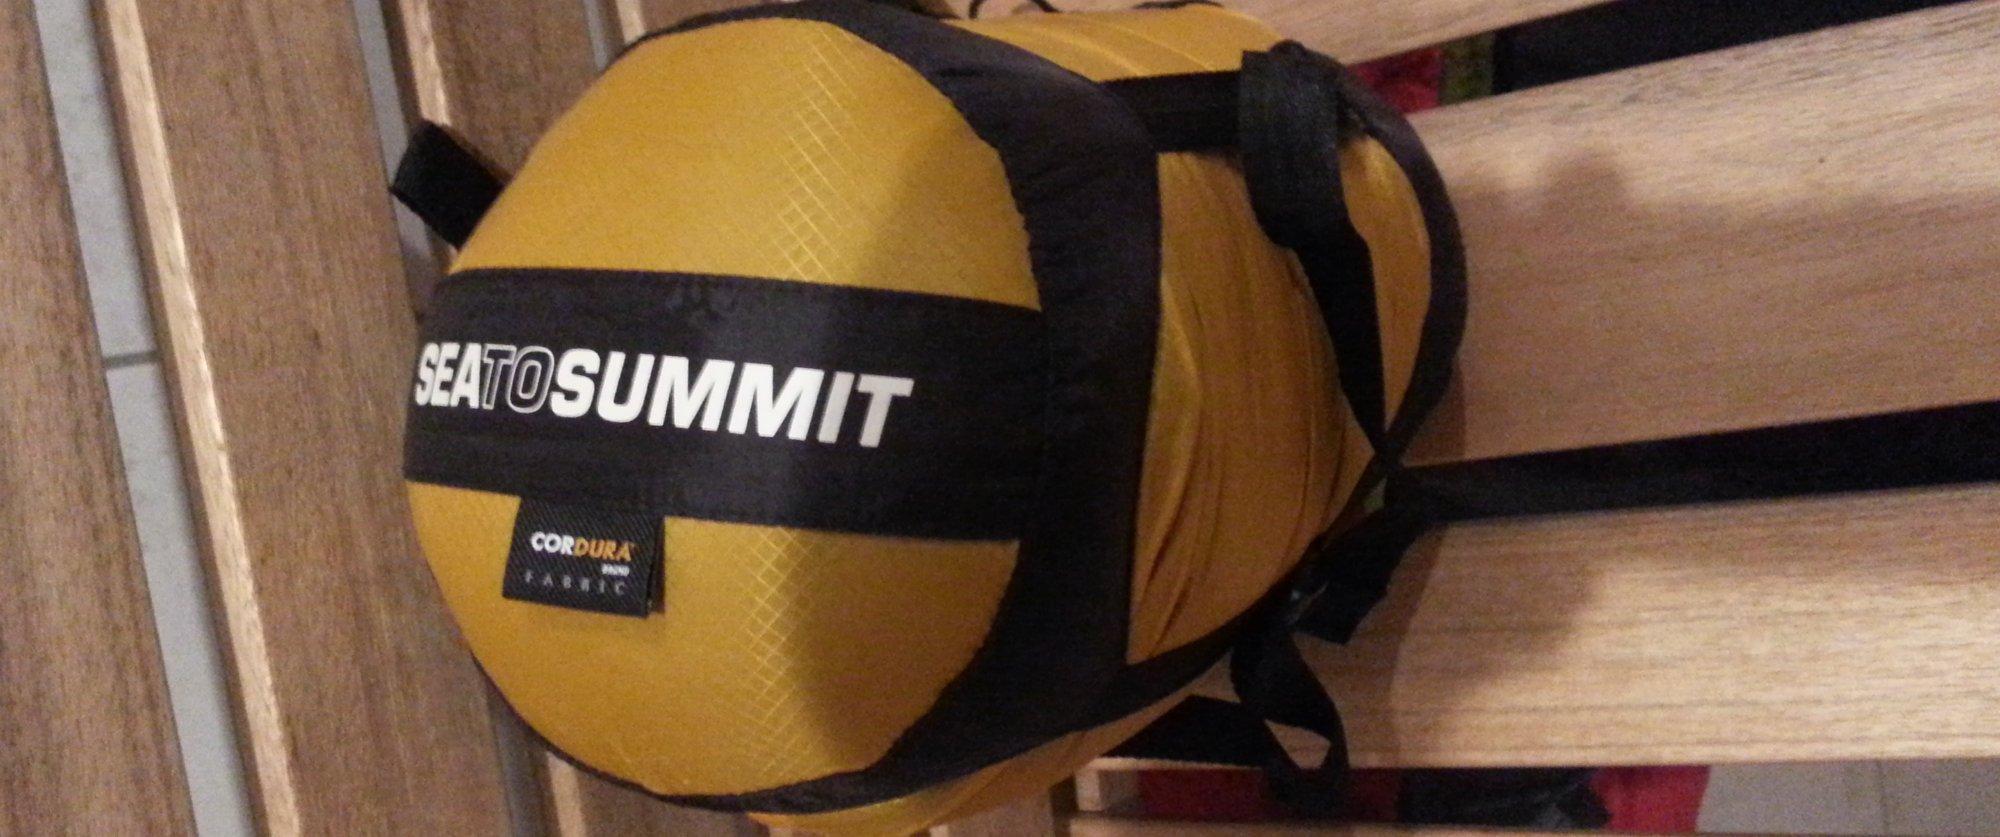 Sea to Summit Ultra sil compression sack